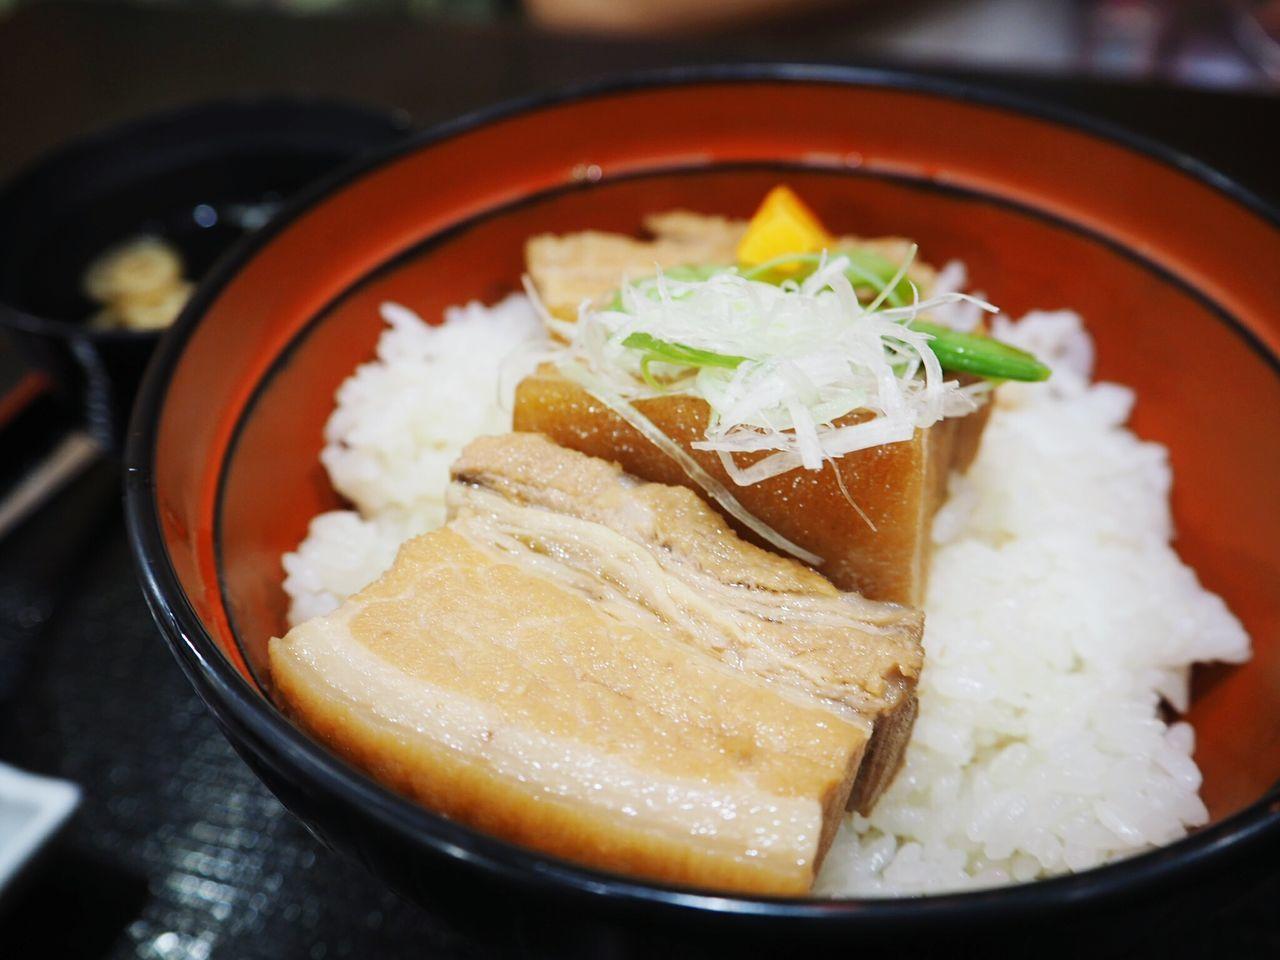 Okinawa Food. Must Eat! Food Bowl Close-up Asian Food No People Rafute Pork Pork Belly Rice Bowl Okinawan Foods Japan Photography Japan Japan Food Must Eat Olympus OM-D E-M10 Mark II